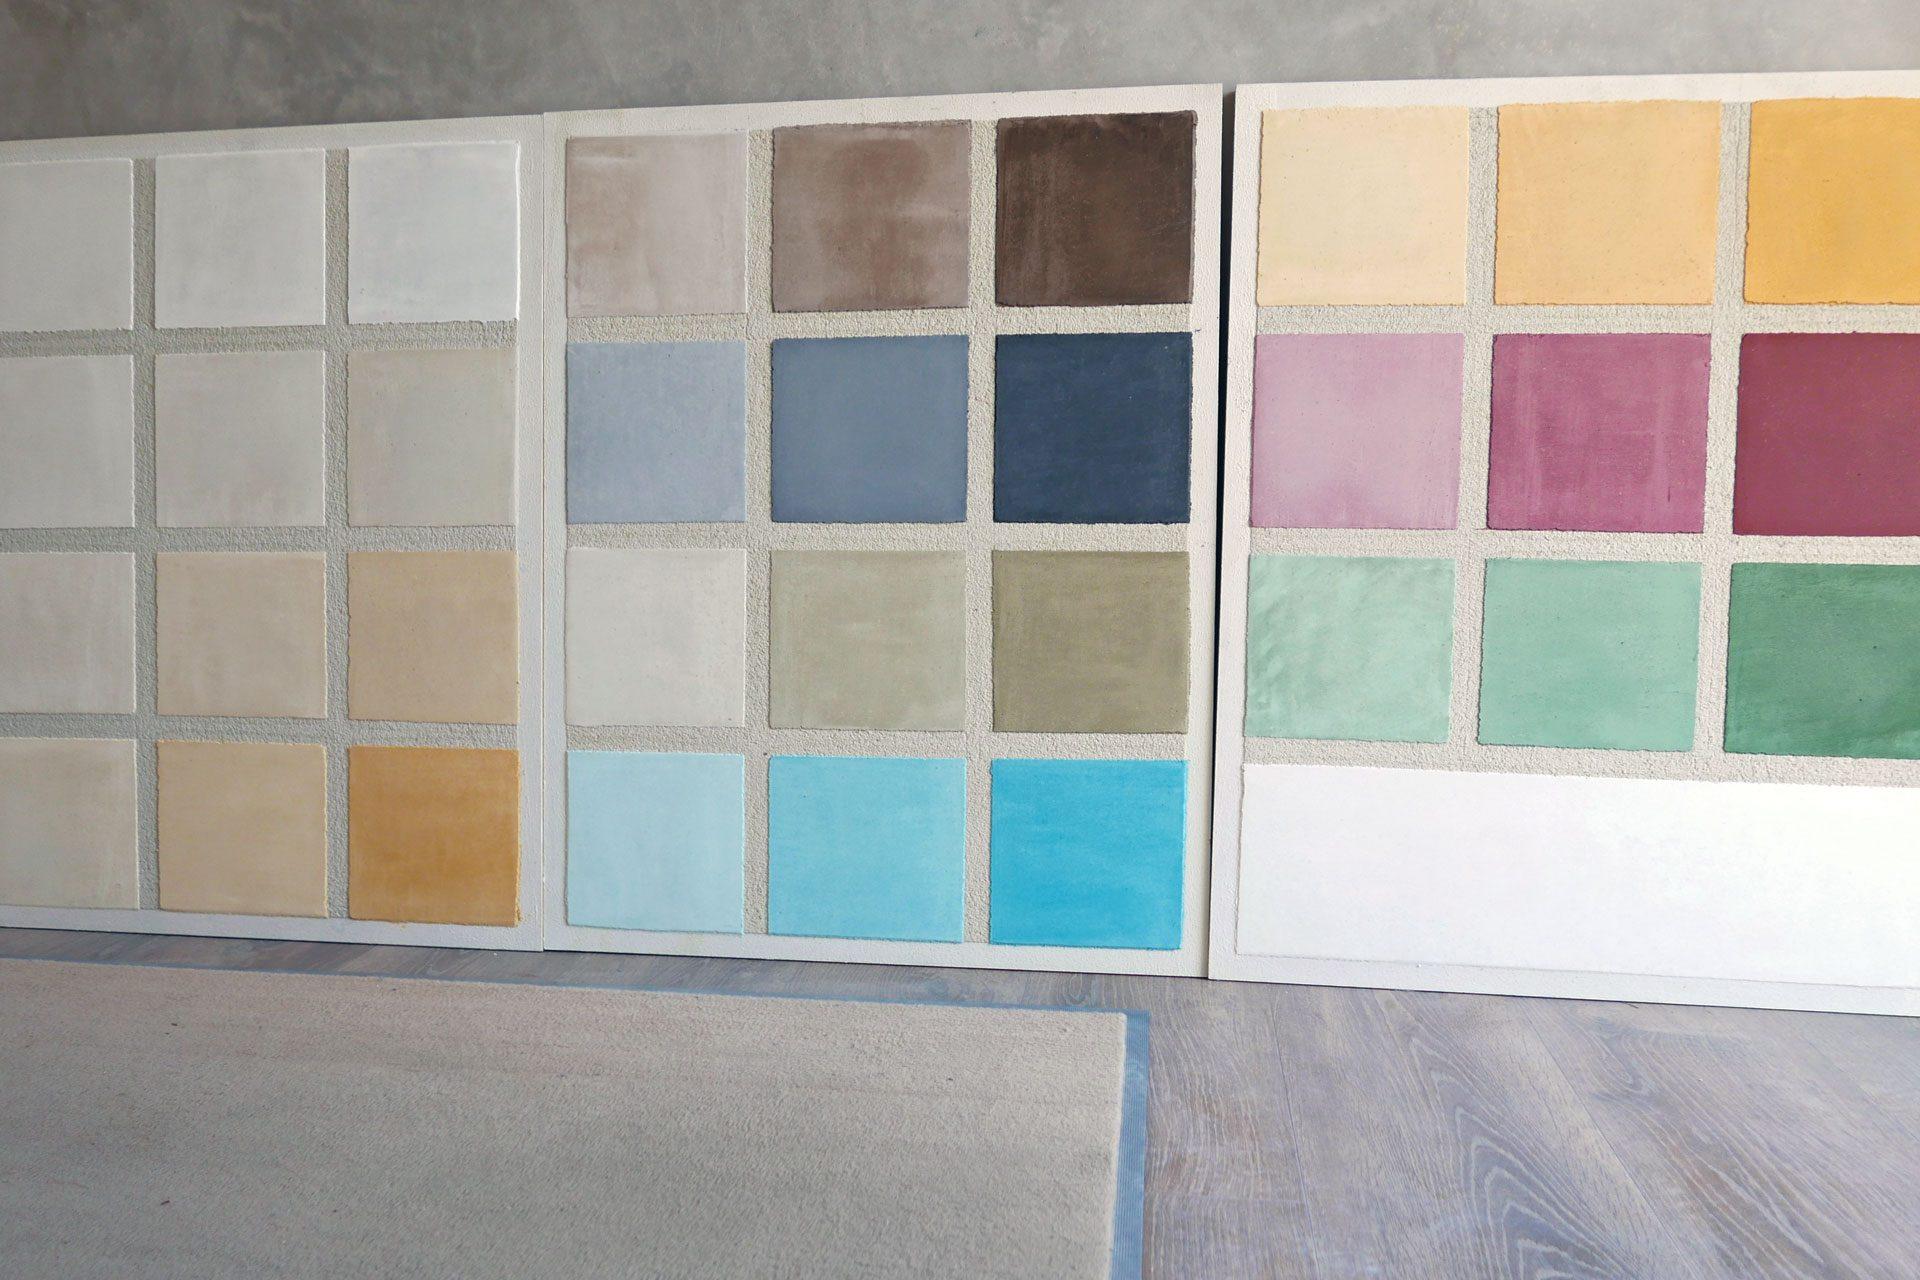 KalkManufaktur Mannheim Farbtafeln